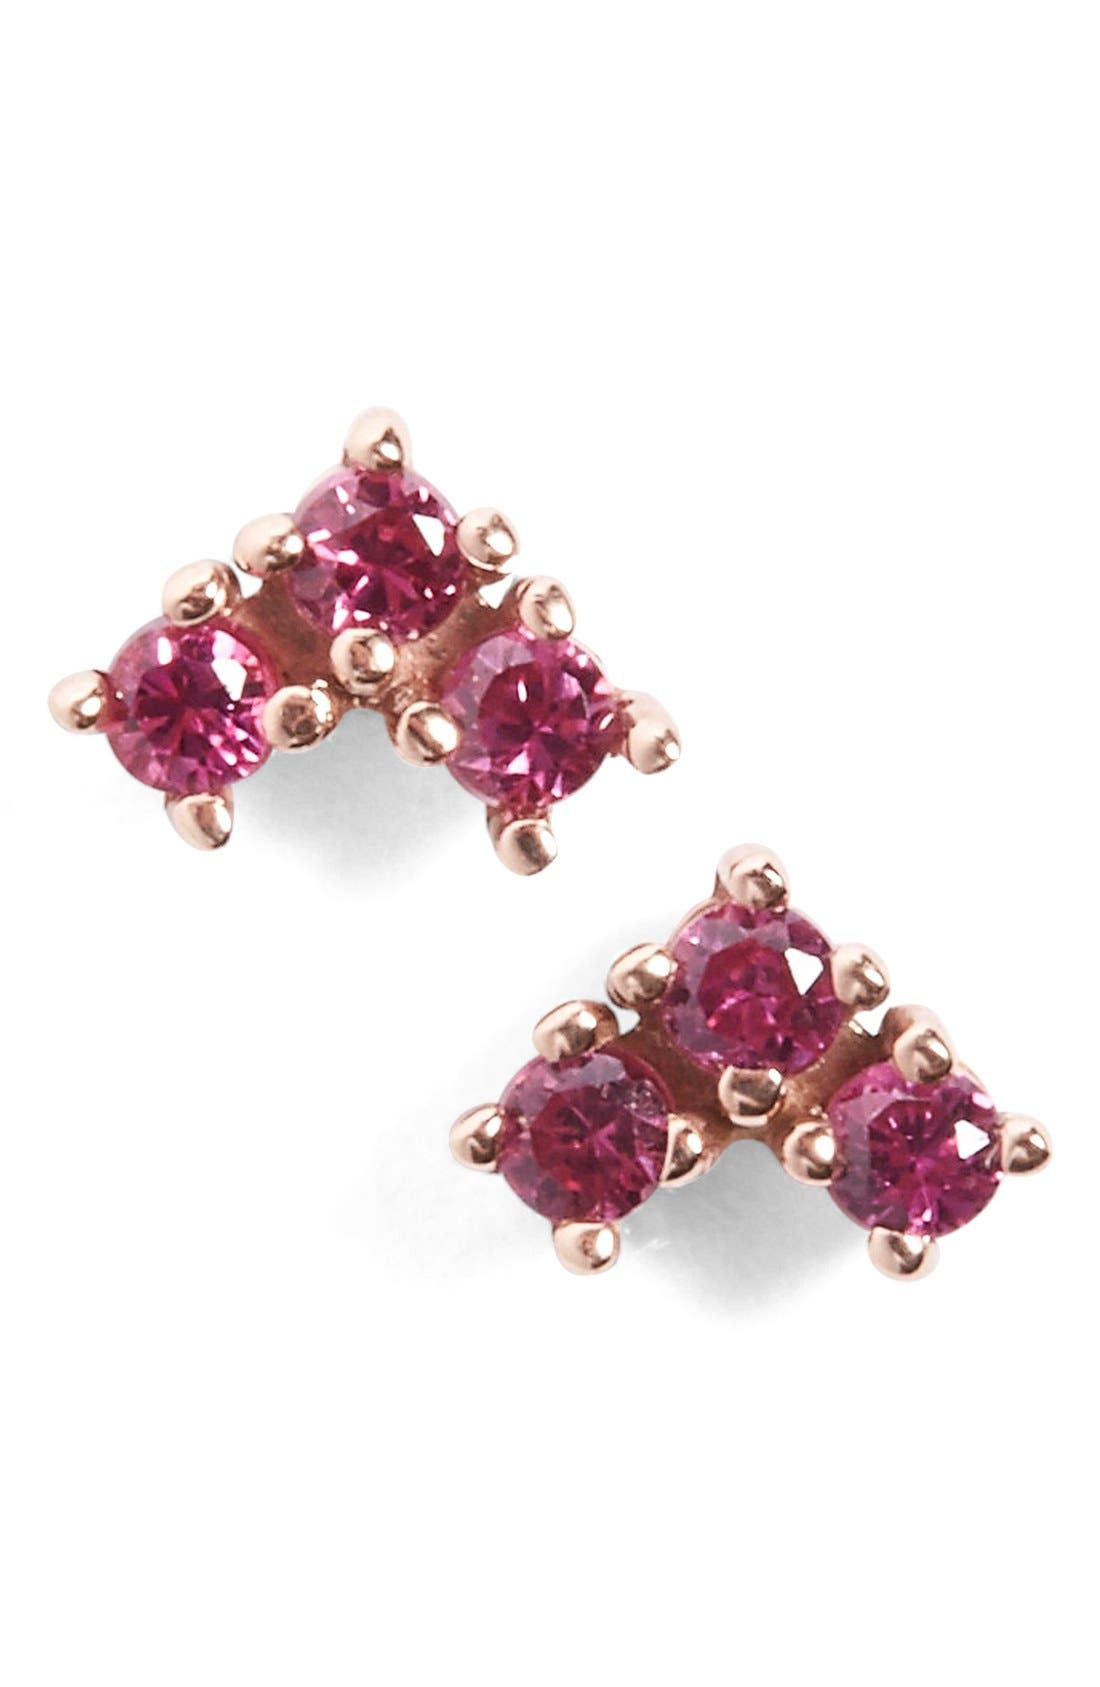 'Bea' Ruby Arrow Stud Earrings,                             Main thumbnail 1, color,                             Rose Ruby